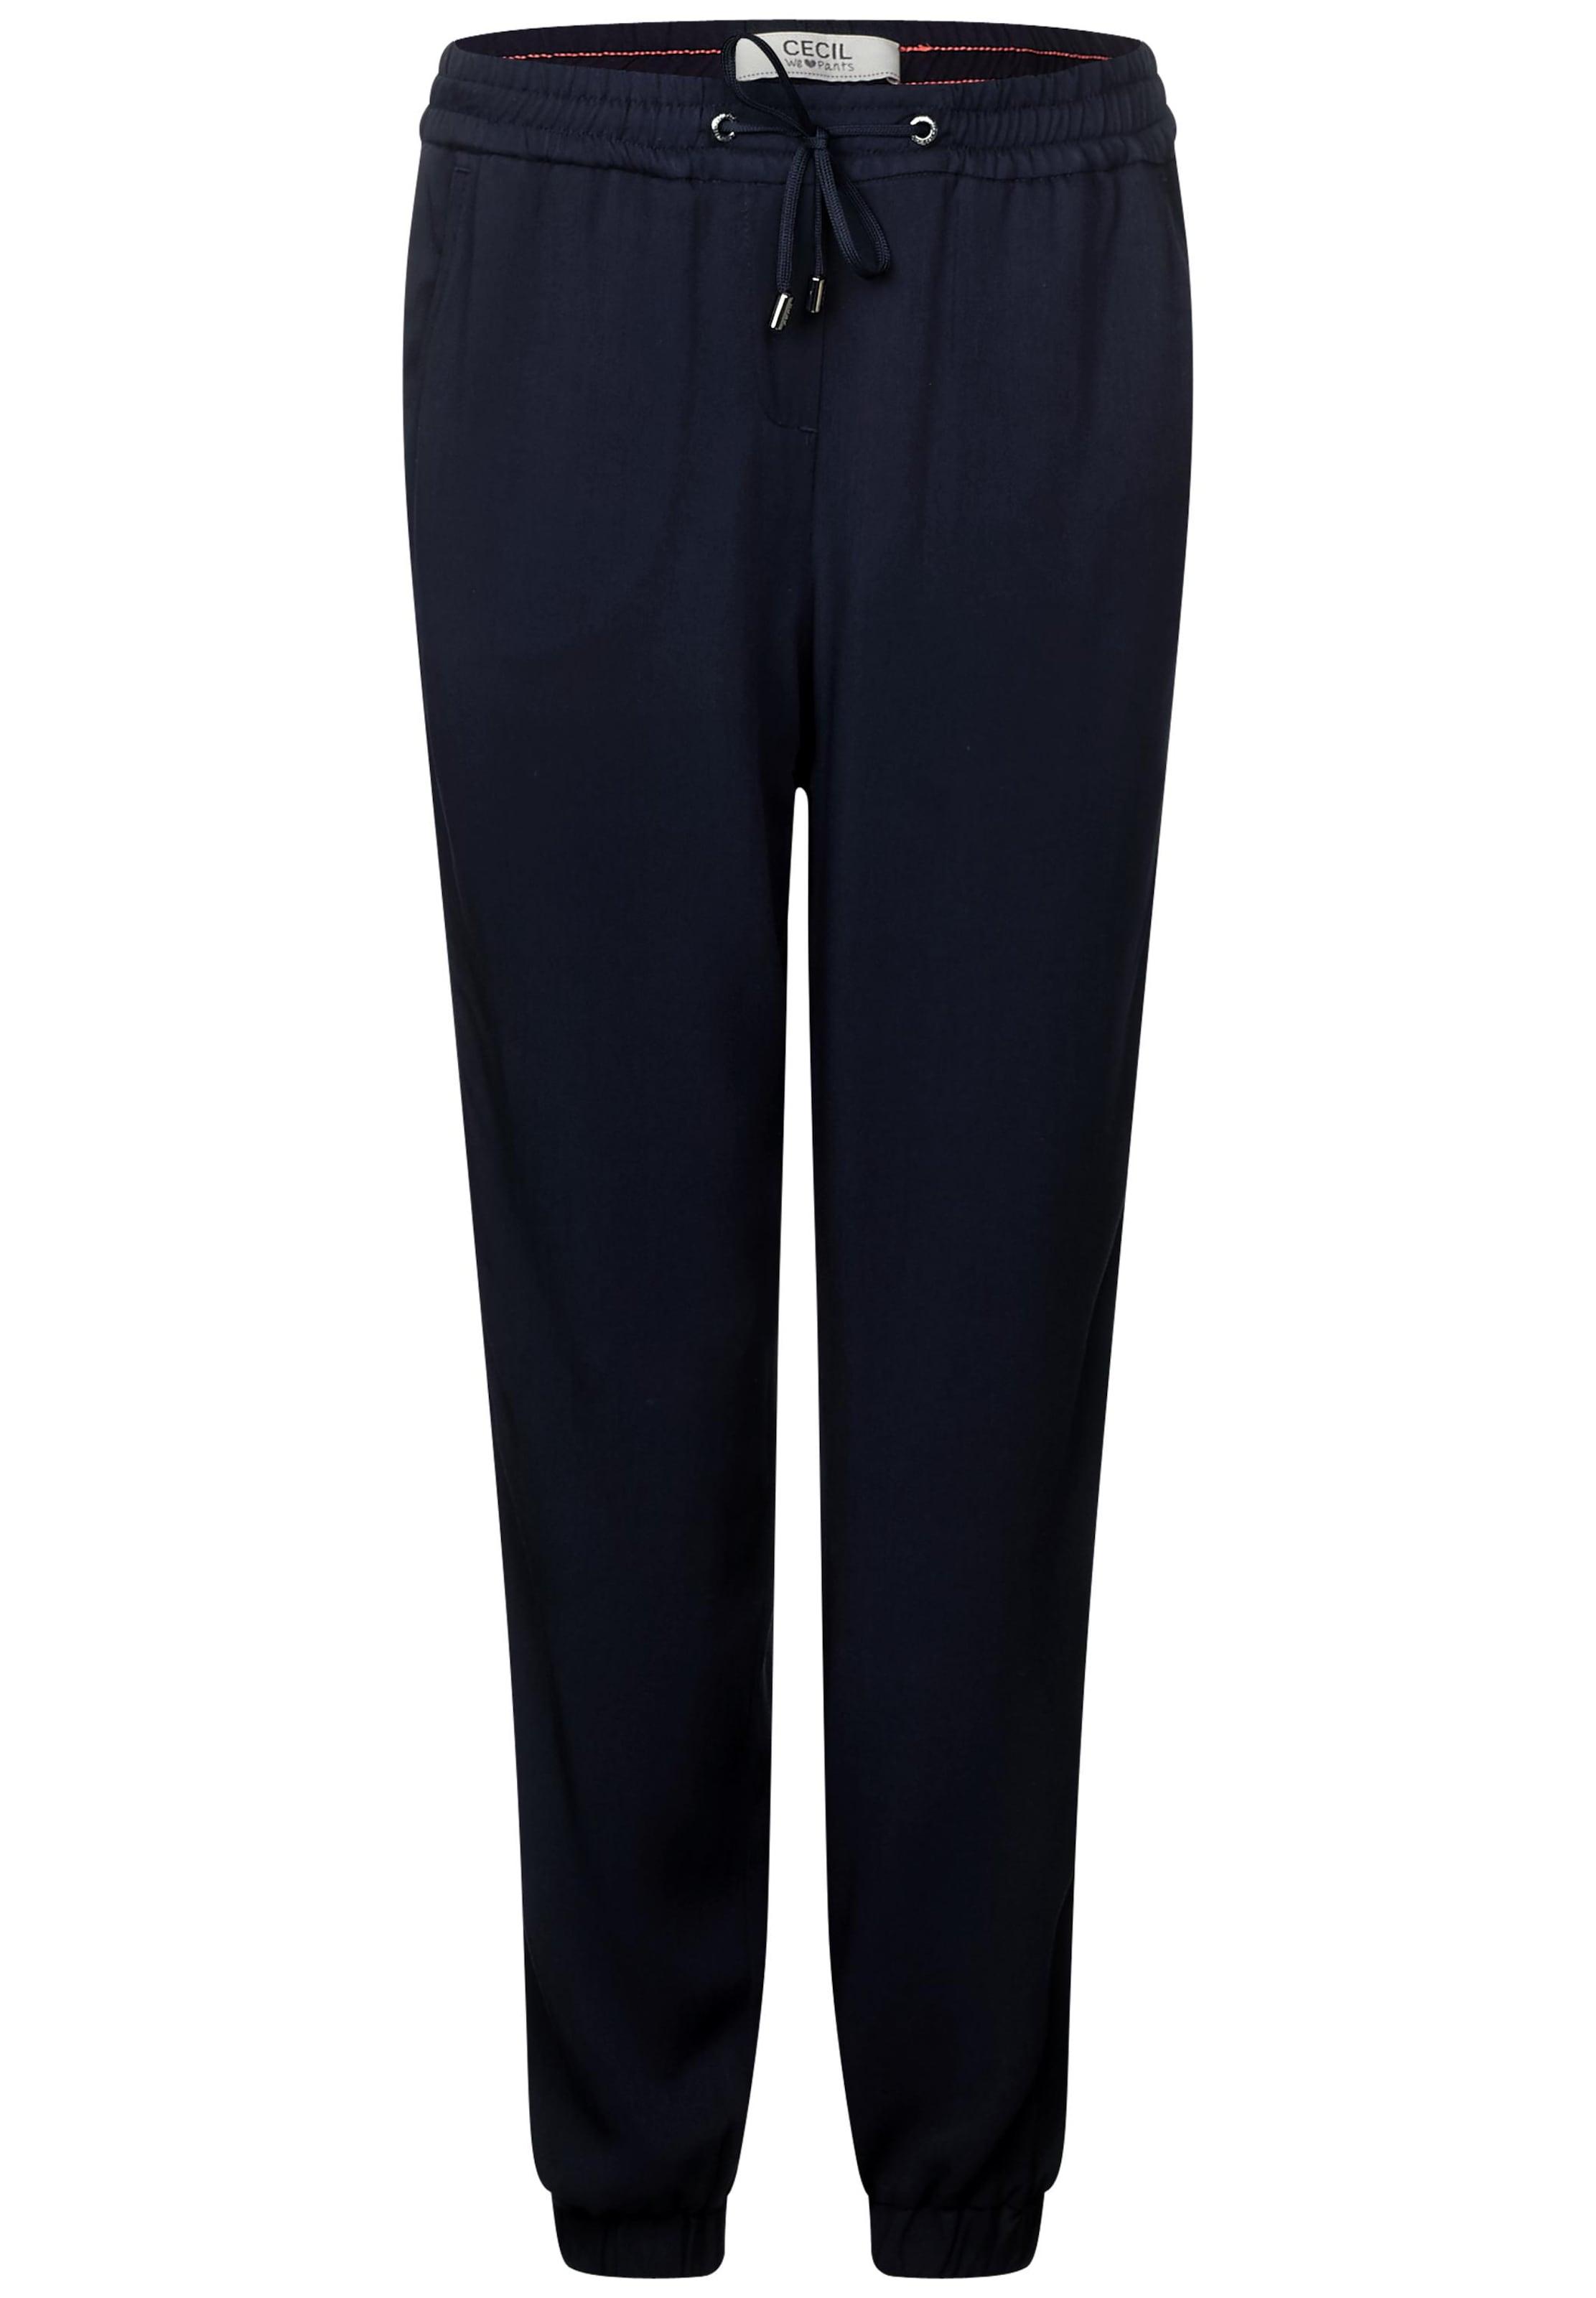 Nachtblau Nachtblau Cecil In Pants 'chelsea' Pants Cecil 'chelsea' 'chelsea' Cecil In Pants zVGLSUMqp